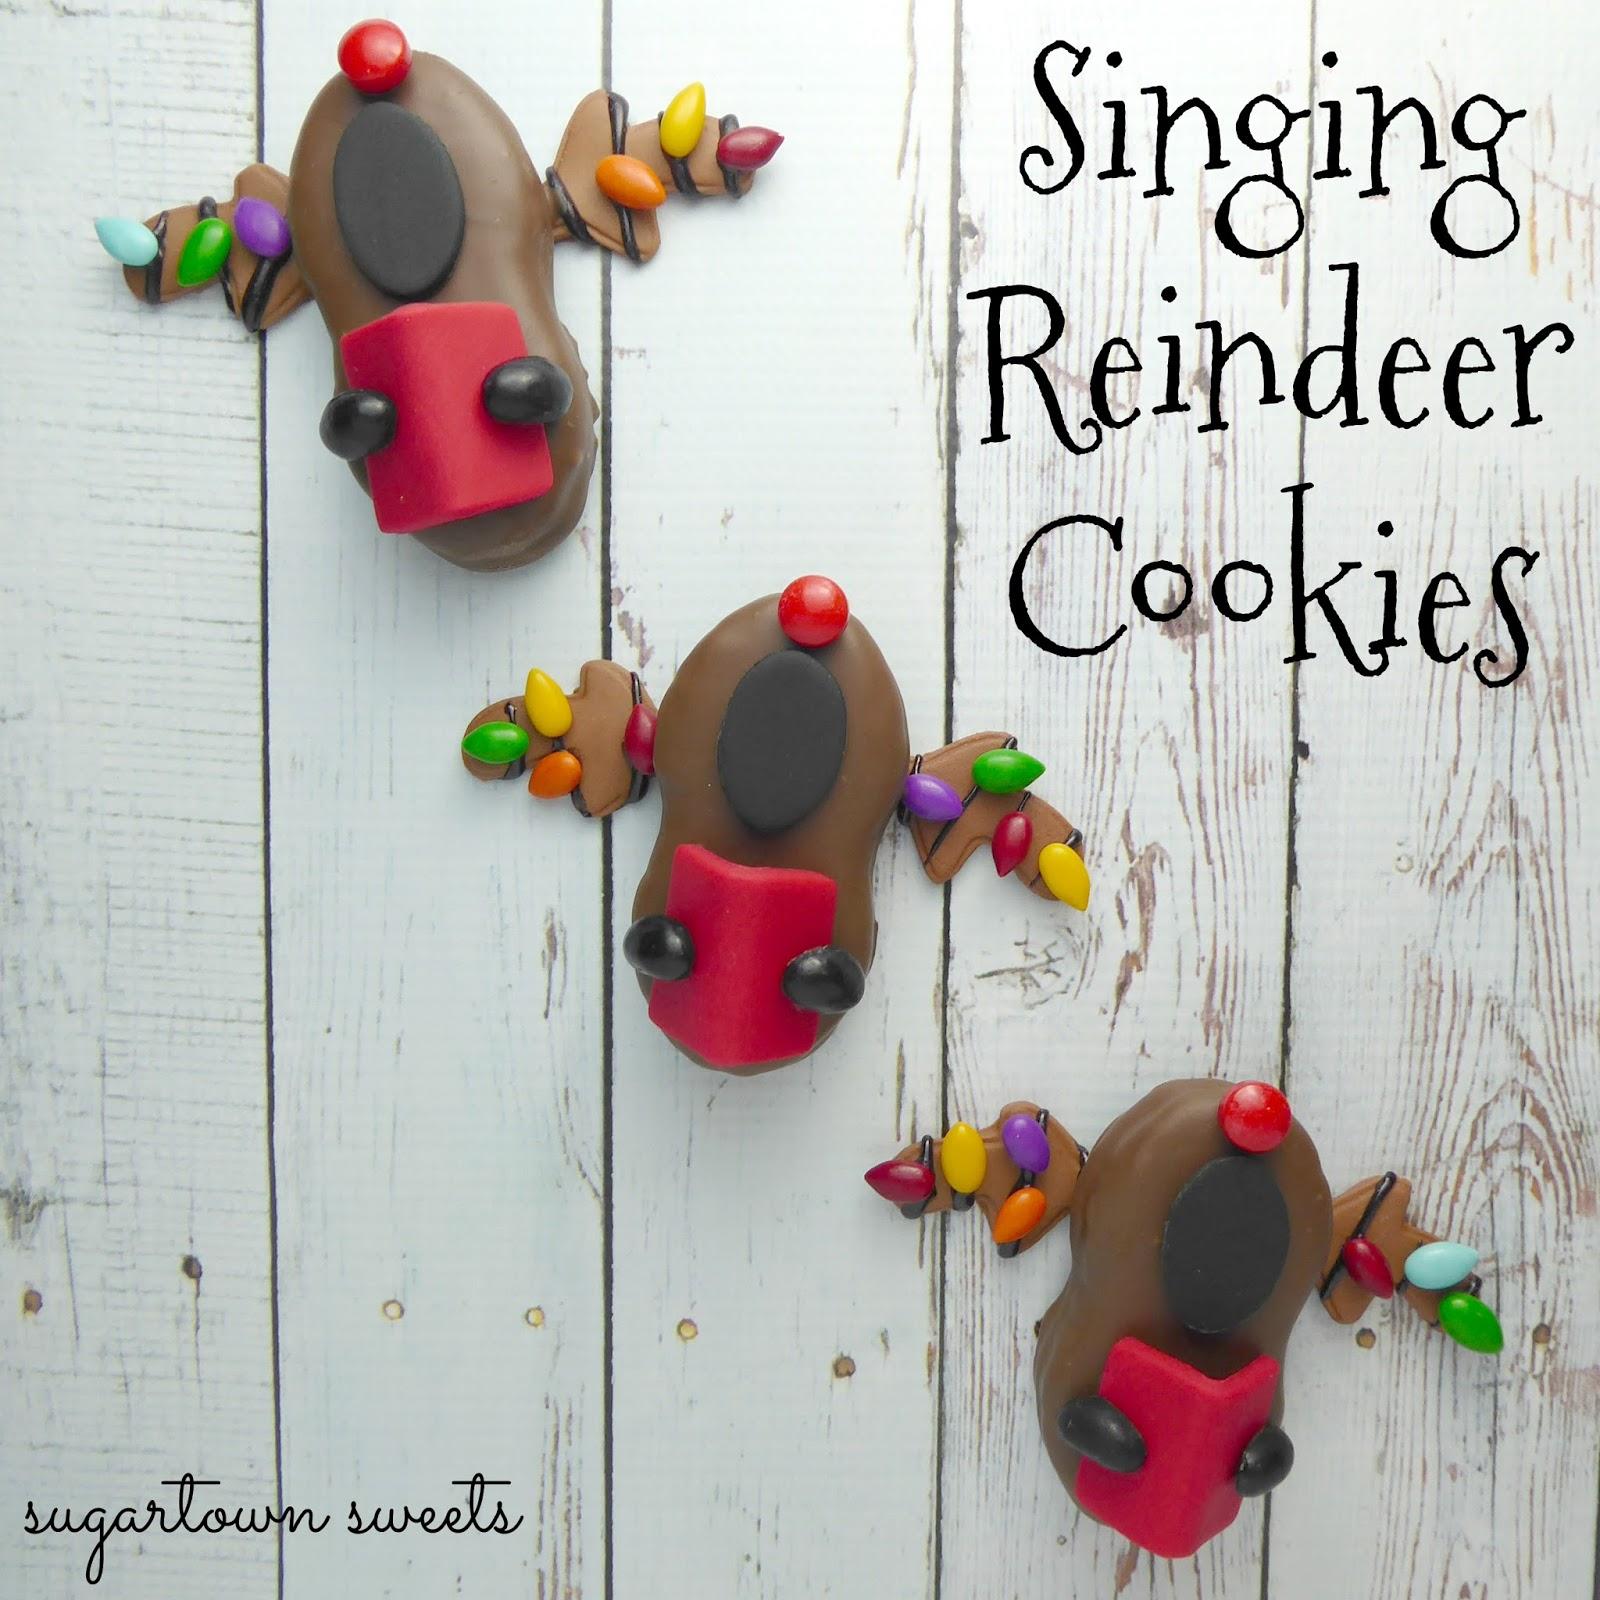 27 In To 37 In Christmas Day Carolers With Songbooks 4: Sugartown Sweets: Singing Reindeer Cookies